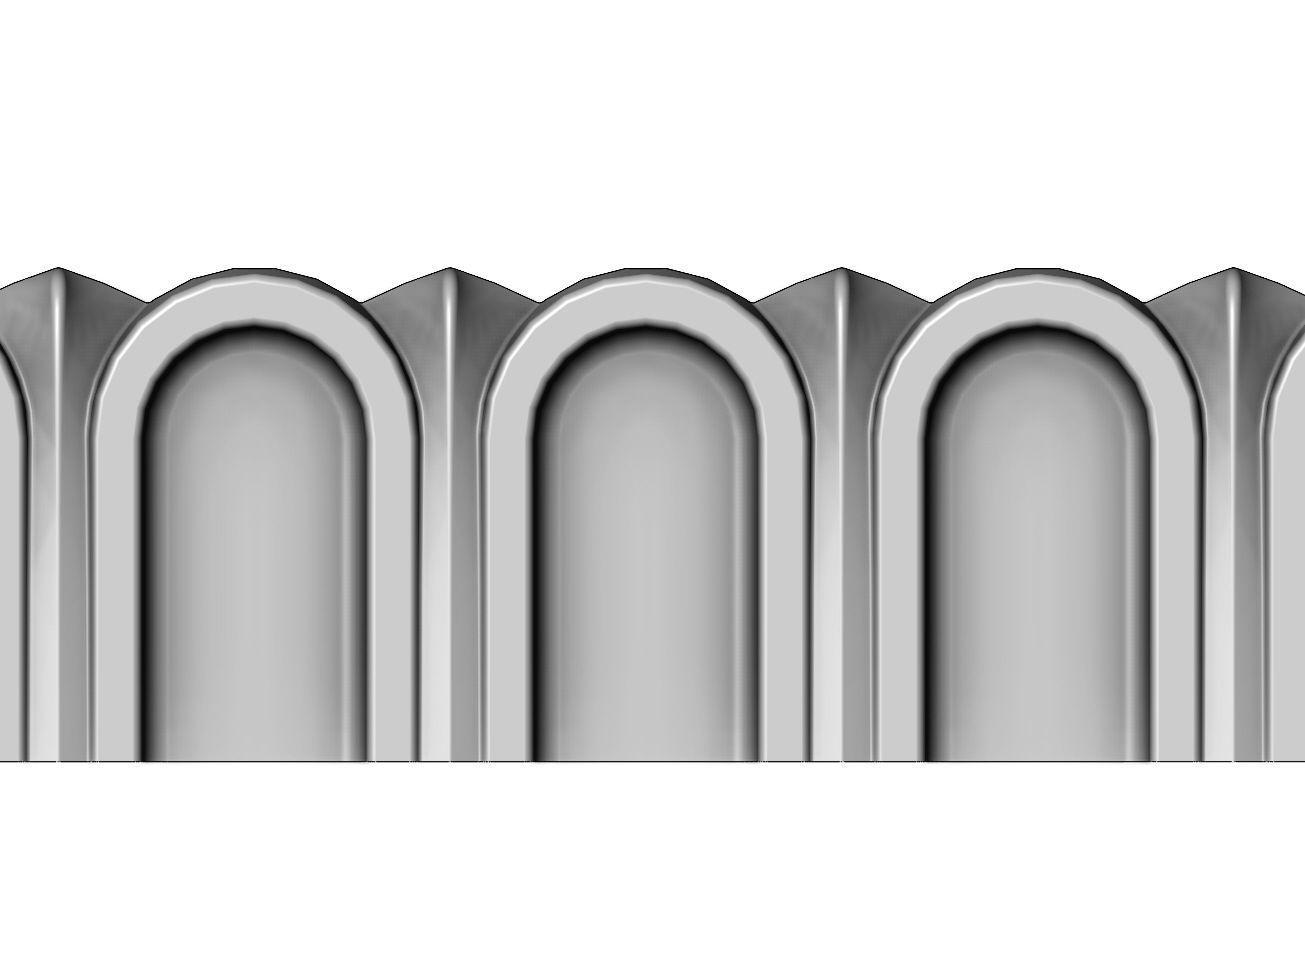 Roman Fluted linear molding